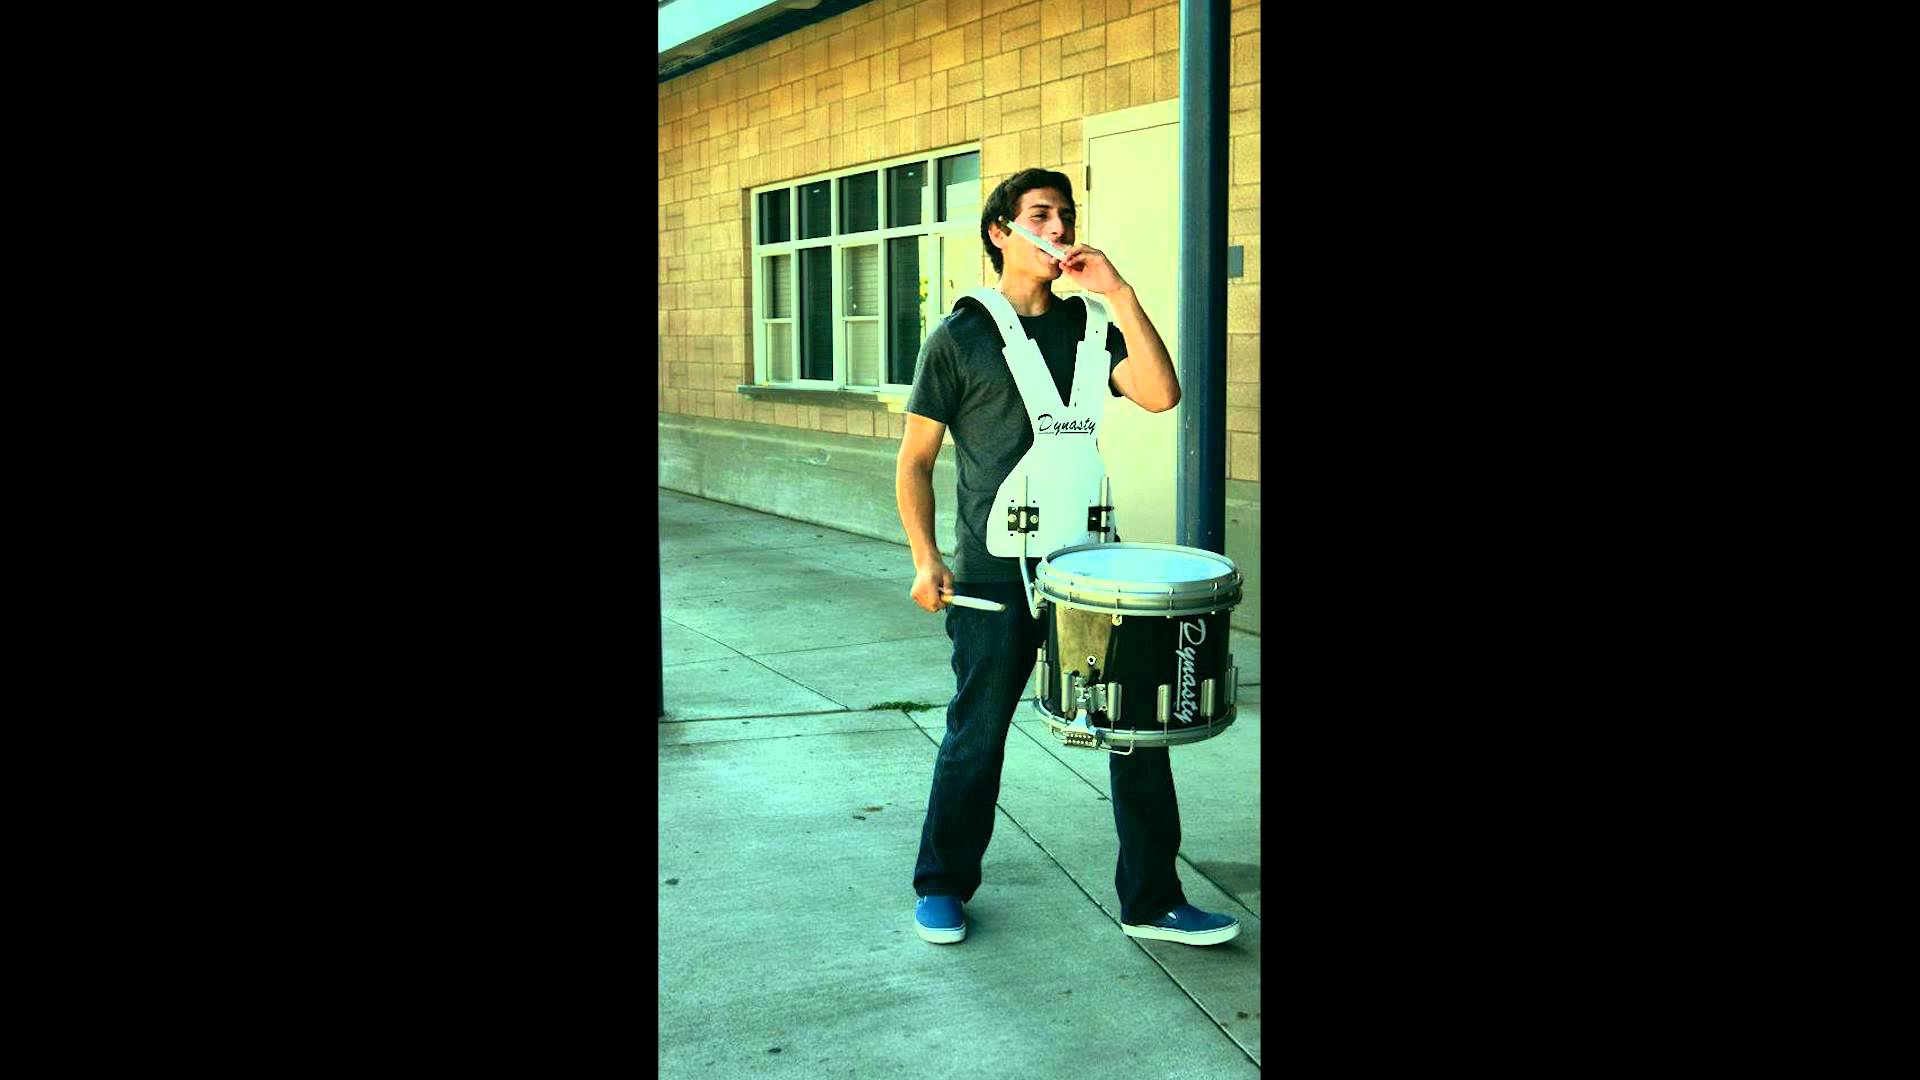 WGI Instrumental Percussion drumline captain drummer / drumming music